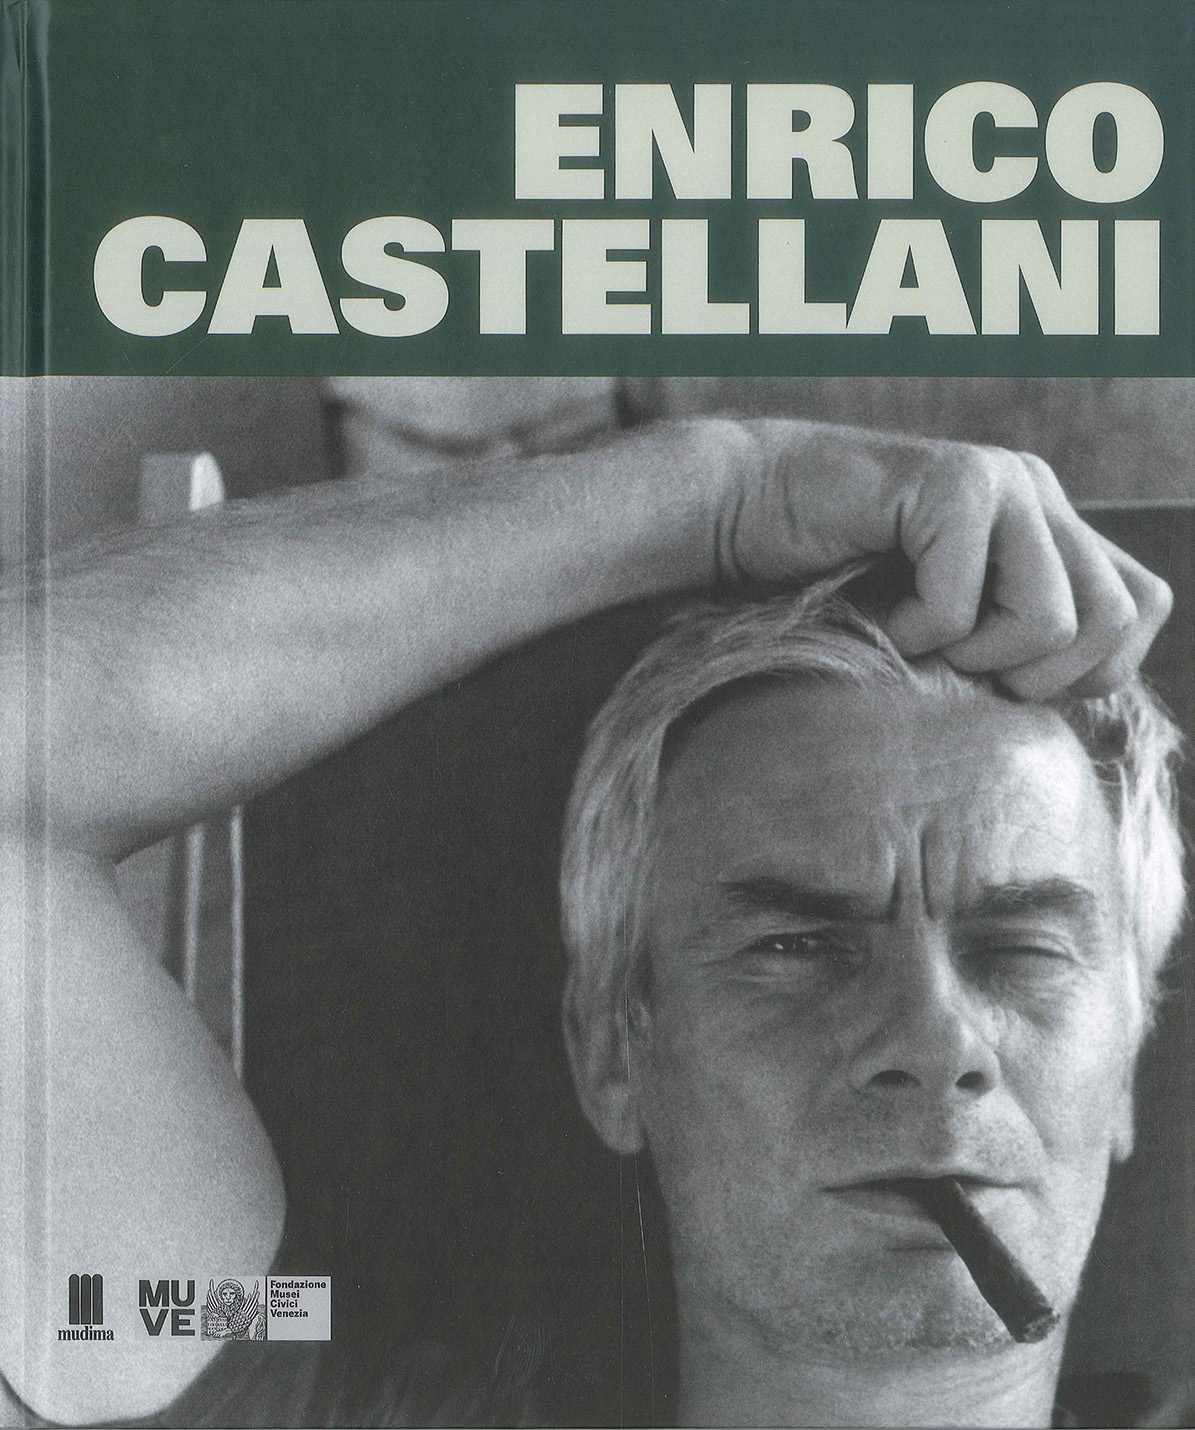 Copertina - Enrico Castellani, Davide Di Maggio, Lóránd Hegyi, 2013, Ca' Pesaro. Galleria Internazionale d'Arte Moderna, Venezia